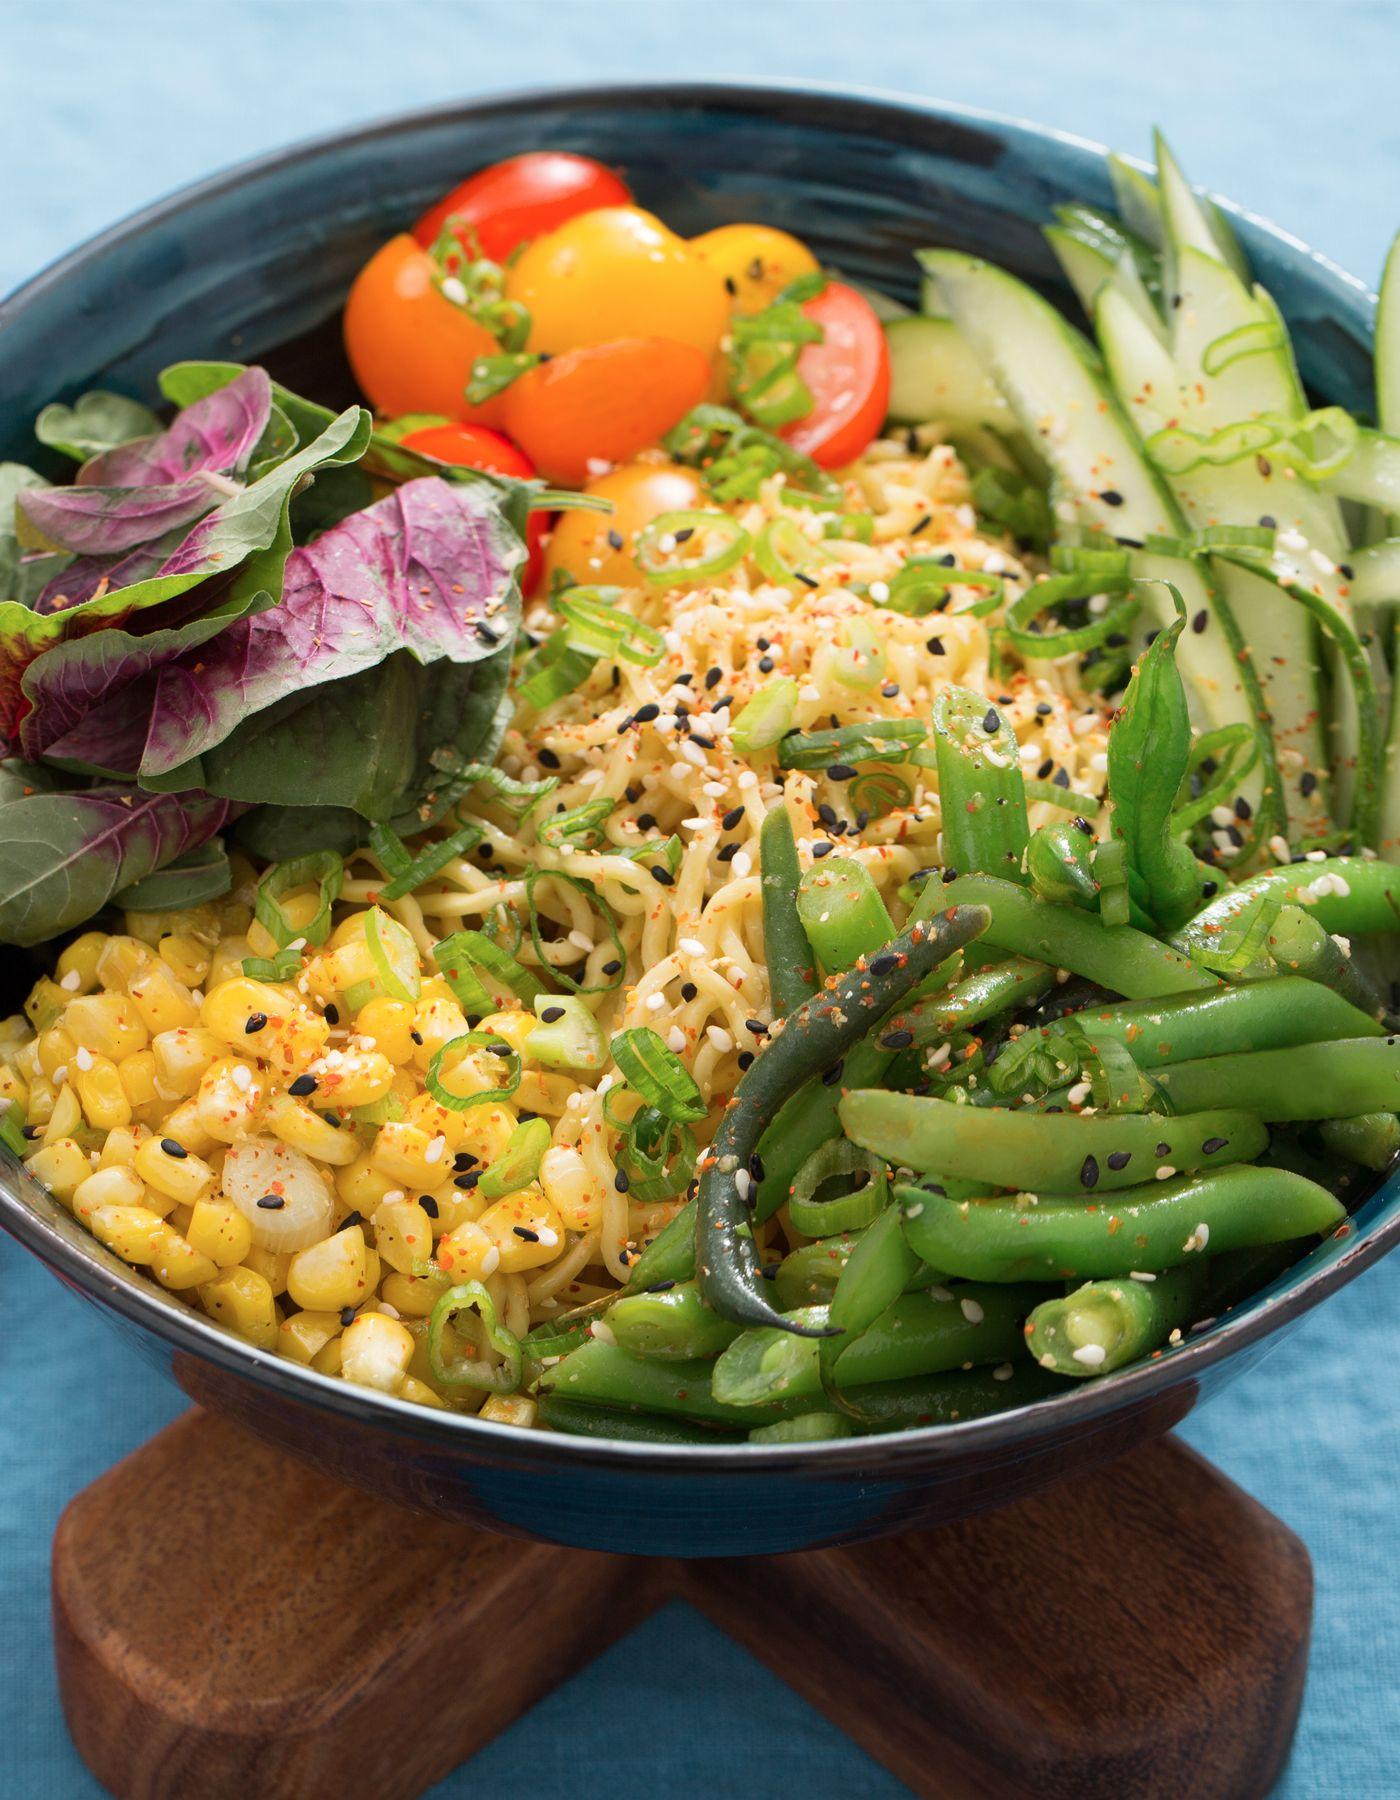 Blue apron ramen - Im Sommer Frische Ramen Nudeln Sci Fi Kochen Laub Cool Summer Blue Apron Veggie Dishes Healthy Foods